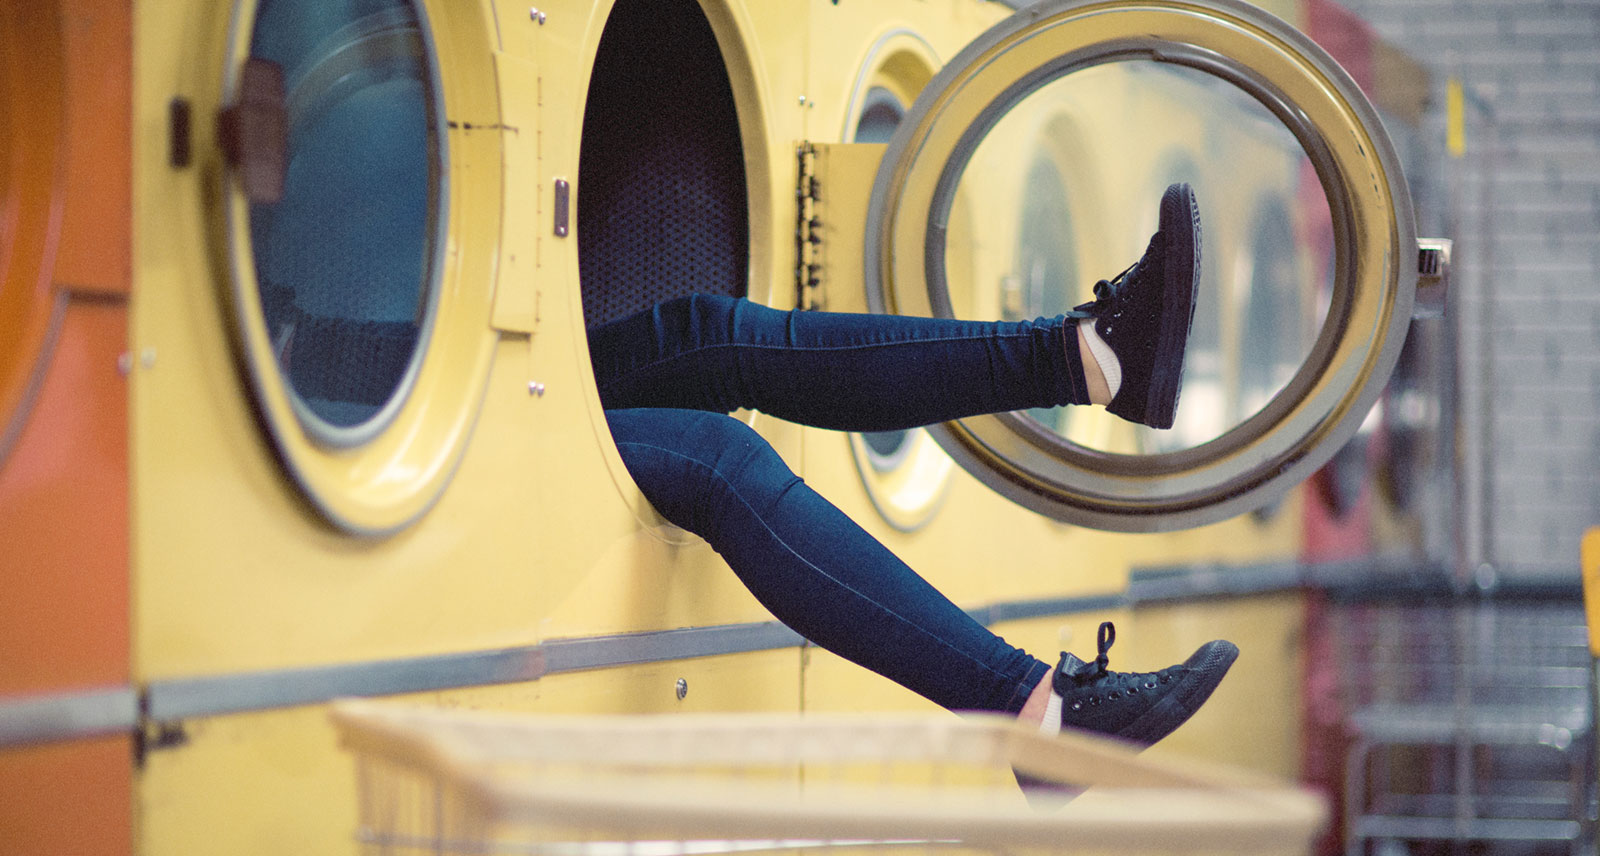 machine-washed.jpg